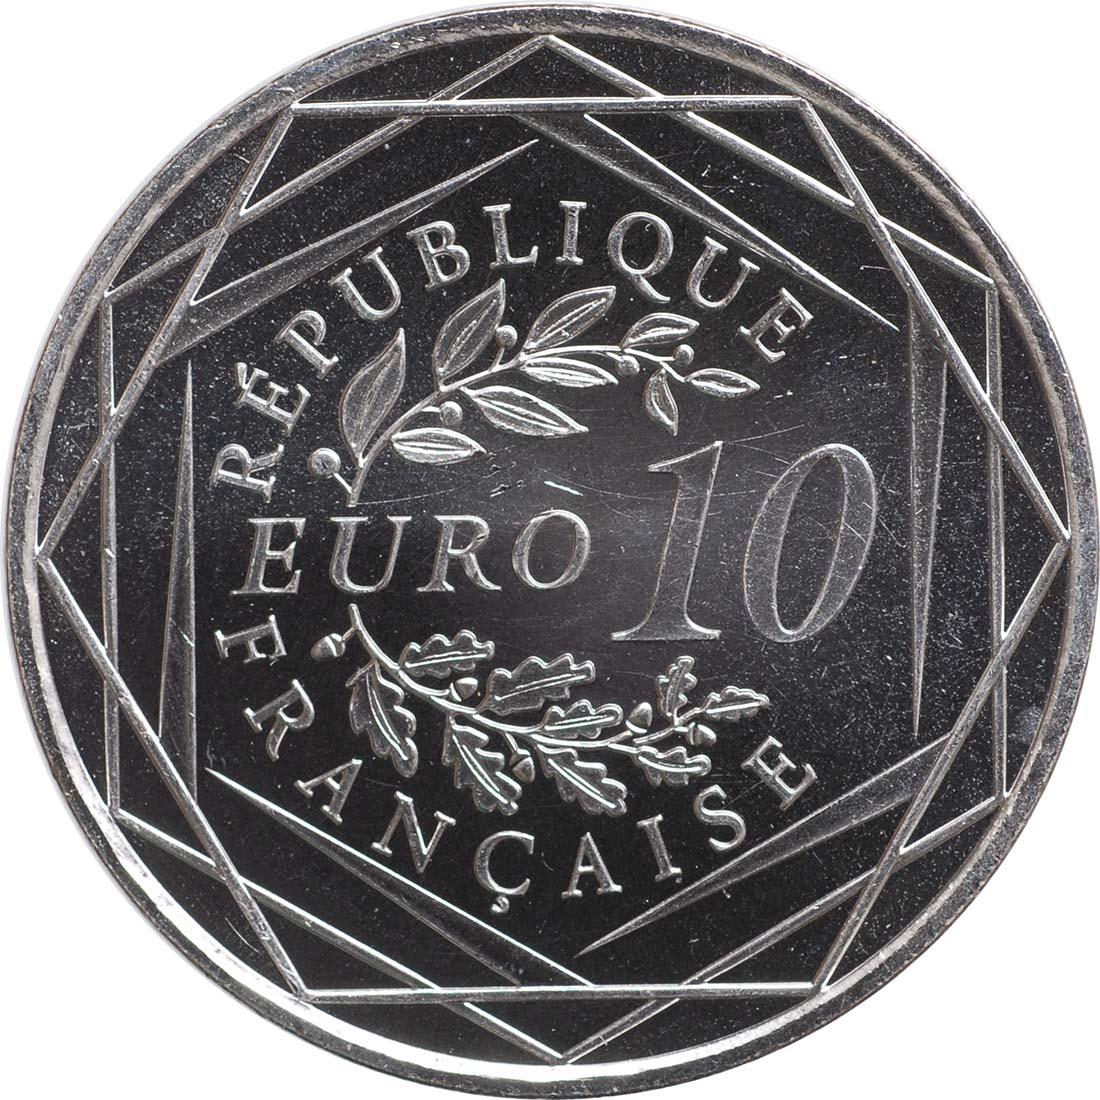 frankreich 10 euro hercules 2012 stgl. Black Bedroom Furniture Sets. Home Design Ideas